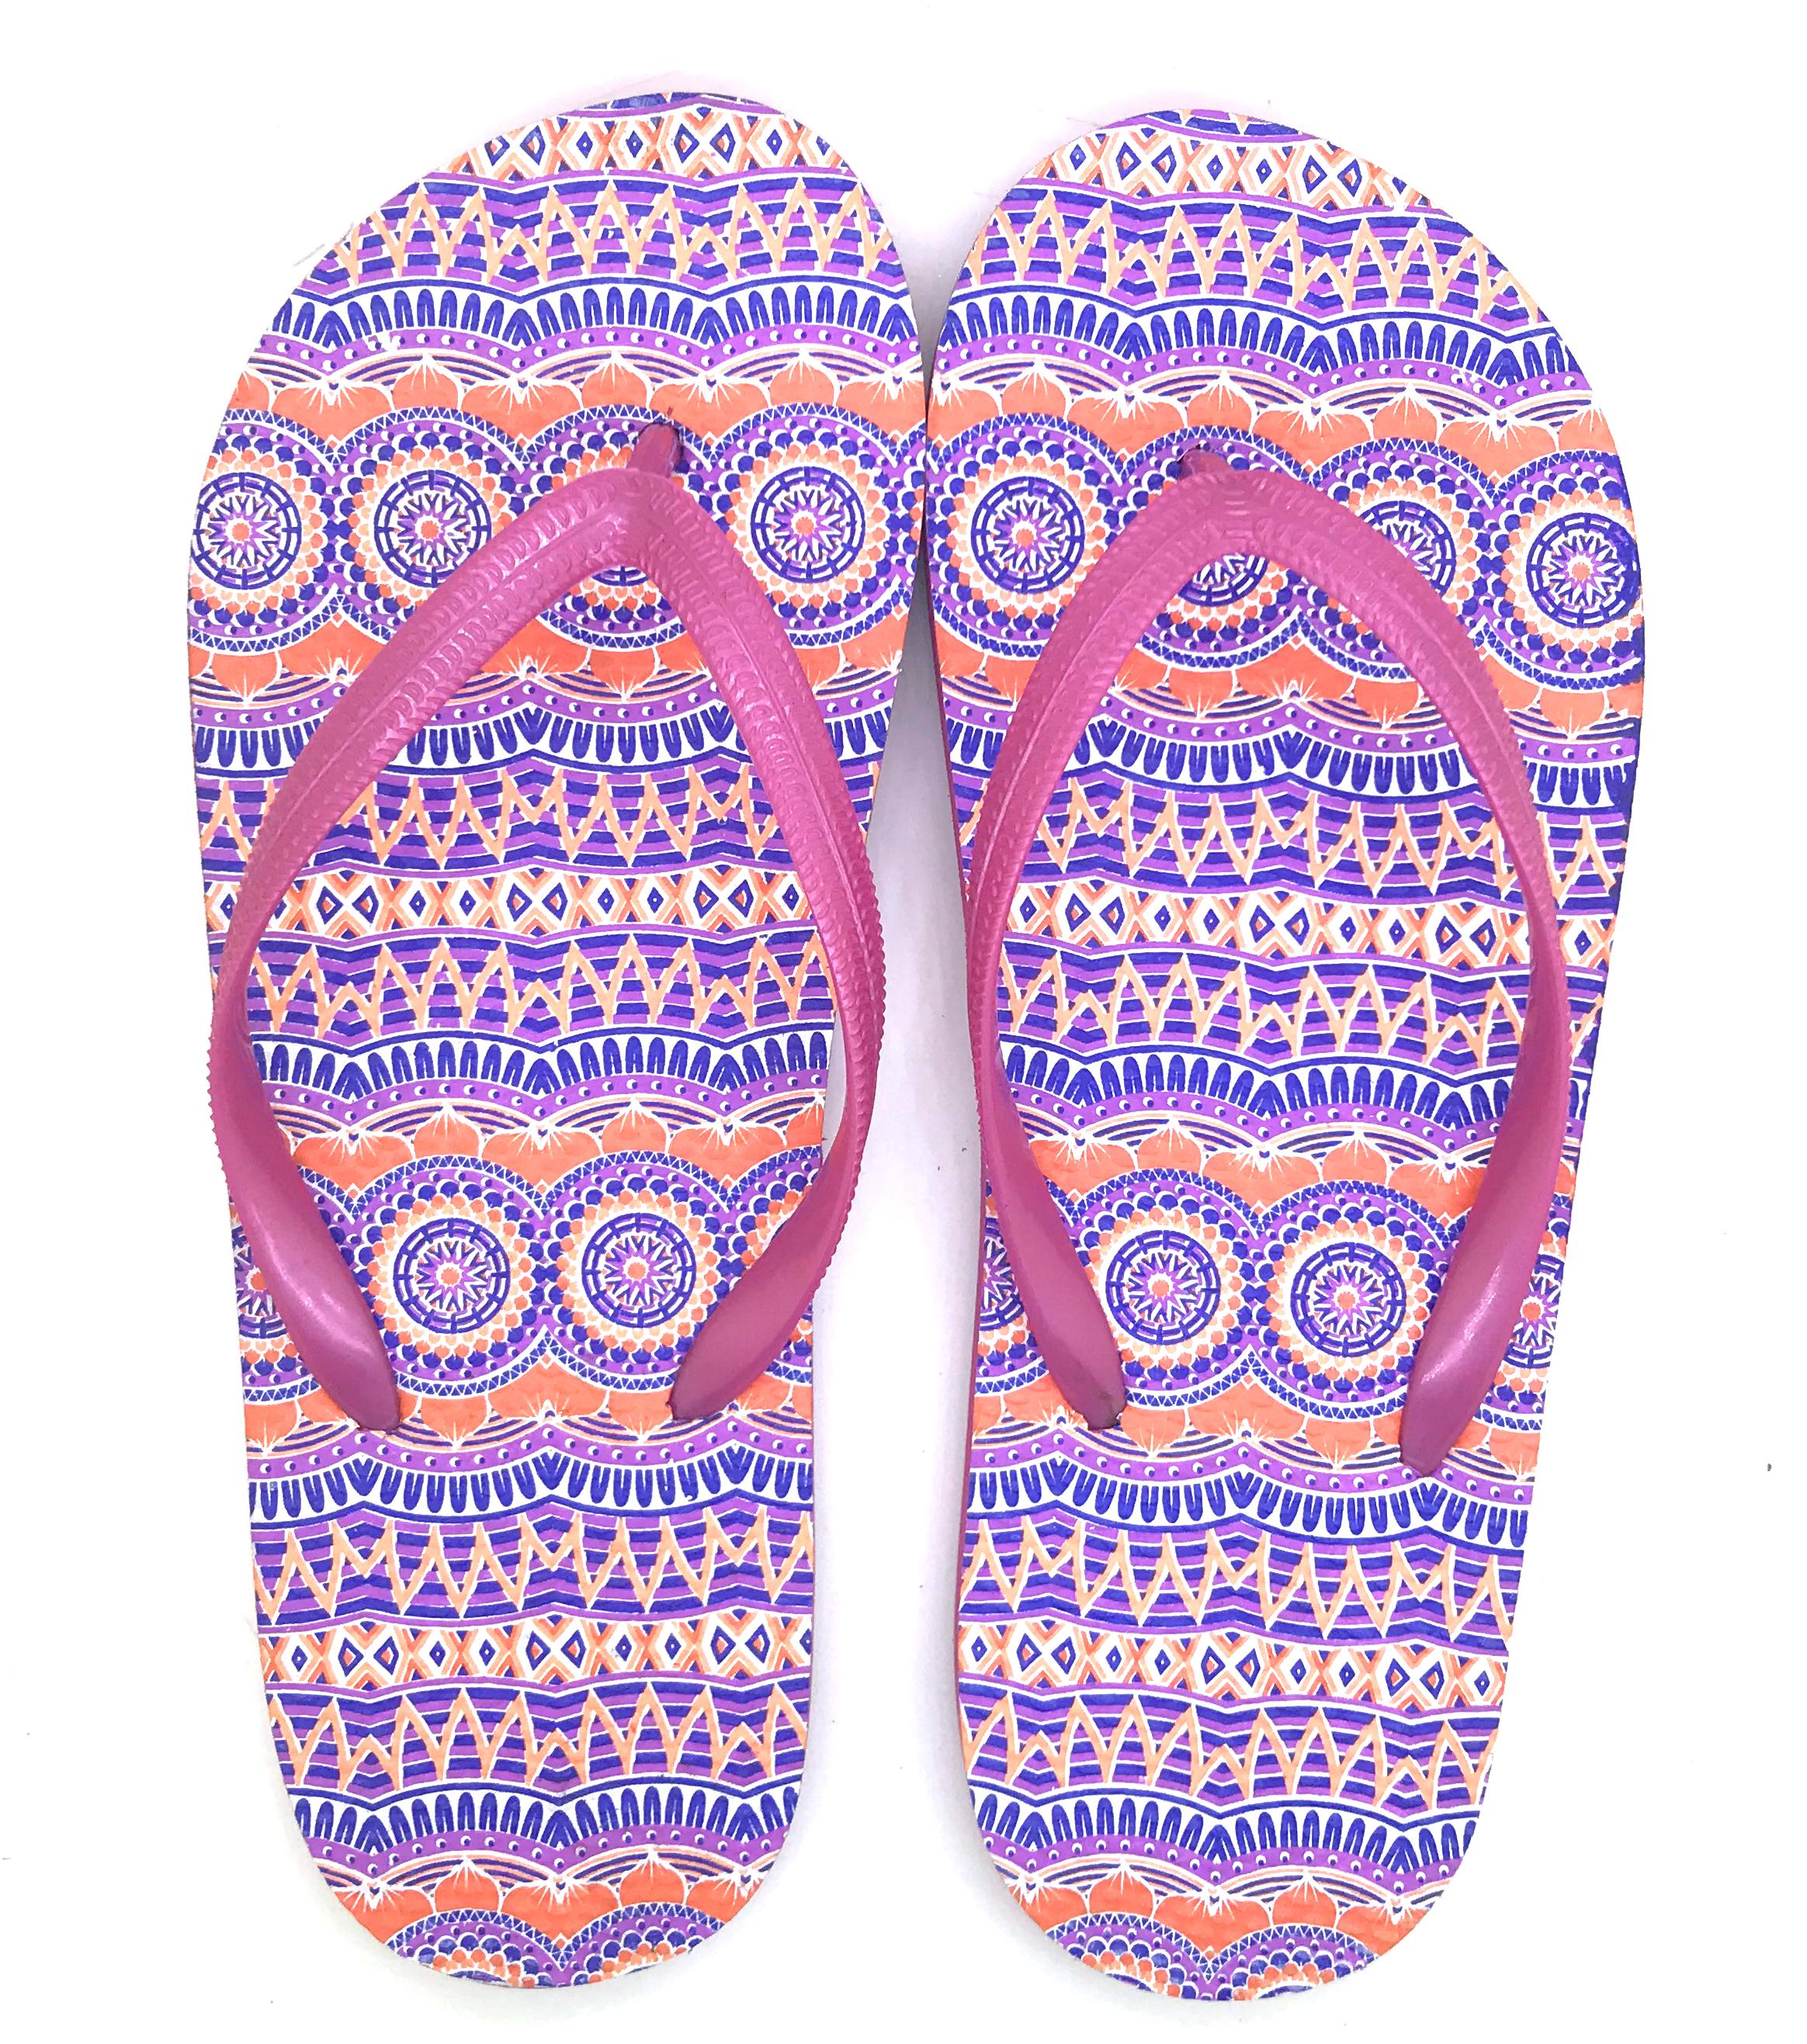 3c9be8d469112 EVERTOP 2019 Hot Sale New Design Custom Printed Beach Rubber Sandals Most  Beautiful Outdoor Summer Flip Flops